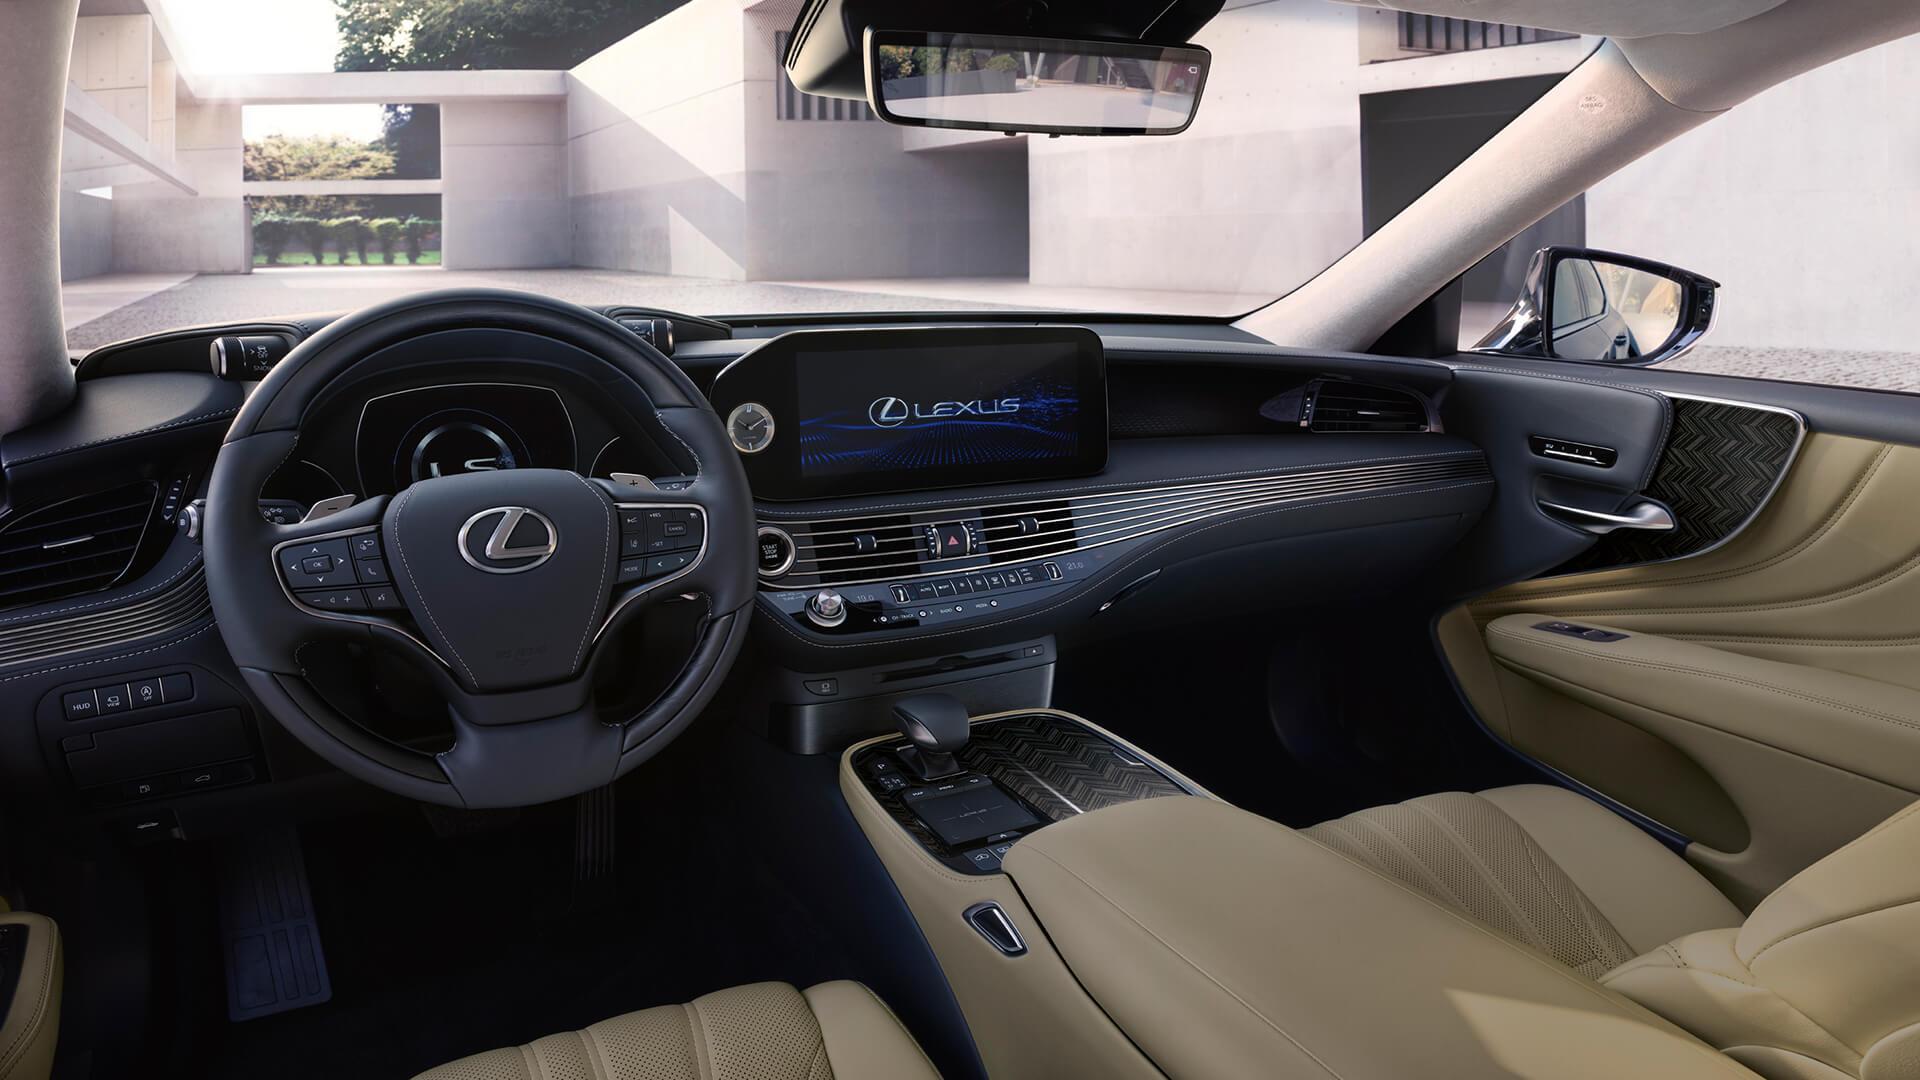 new 2020 lexus ls experience driver focused cockpit